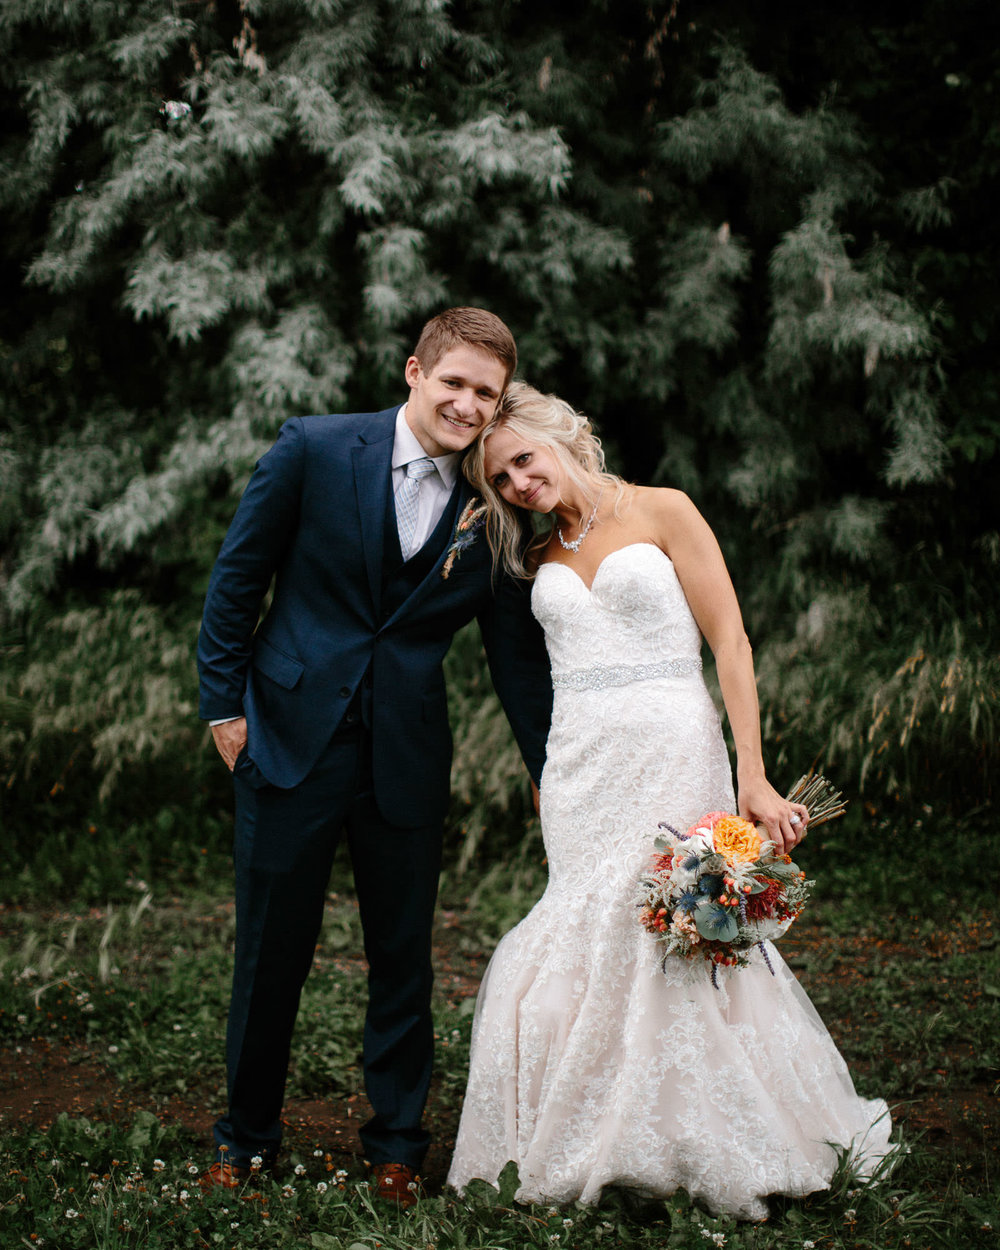 meadow-barn-wedding-sioux-falls-south-dakota-romantic-adventerous-michael-liedtke-photography089.jpg